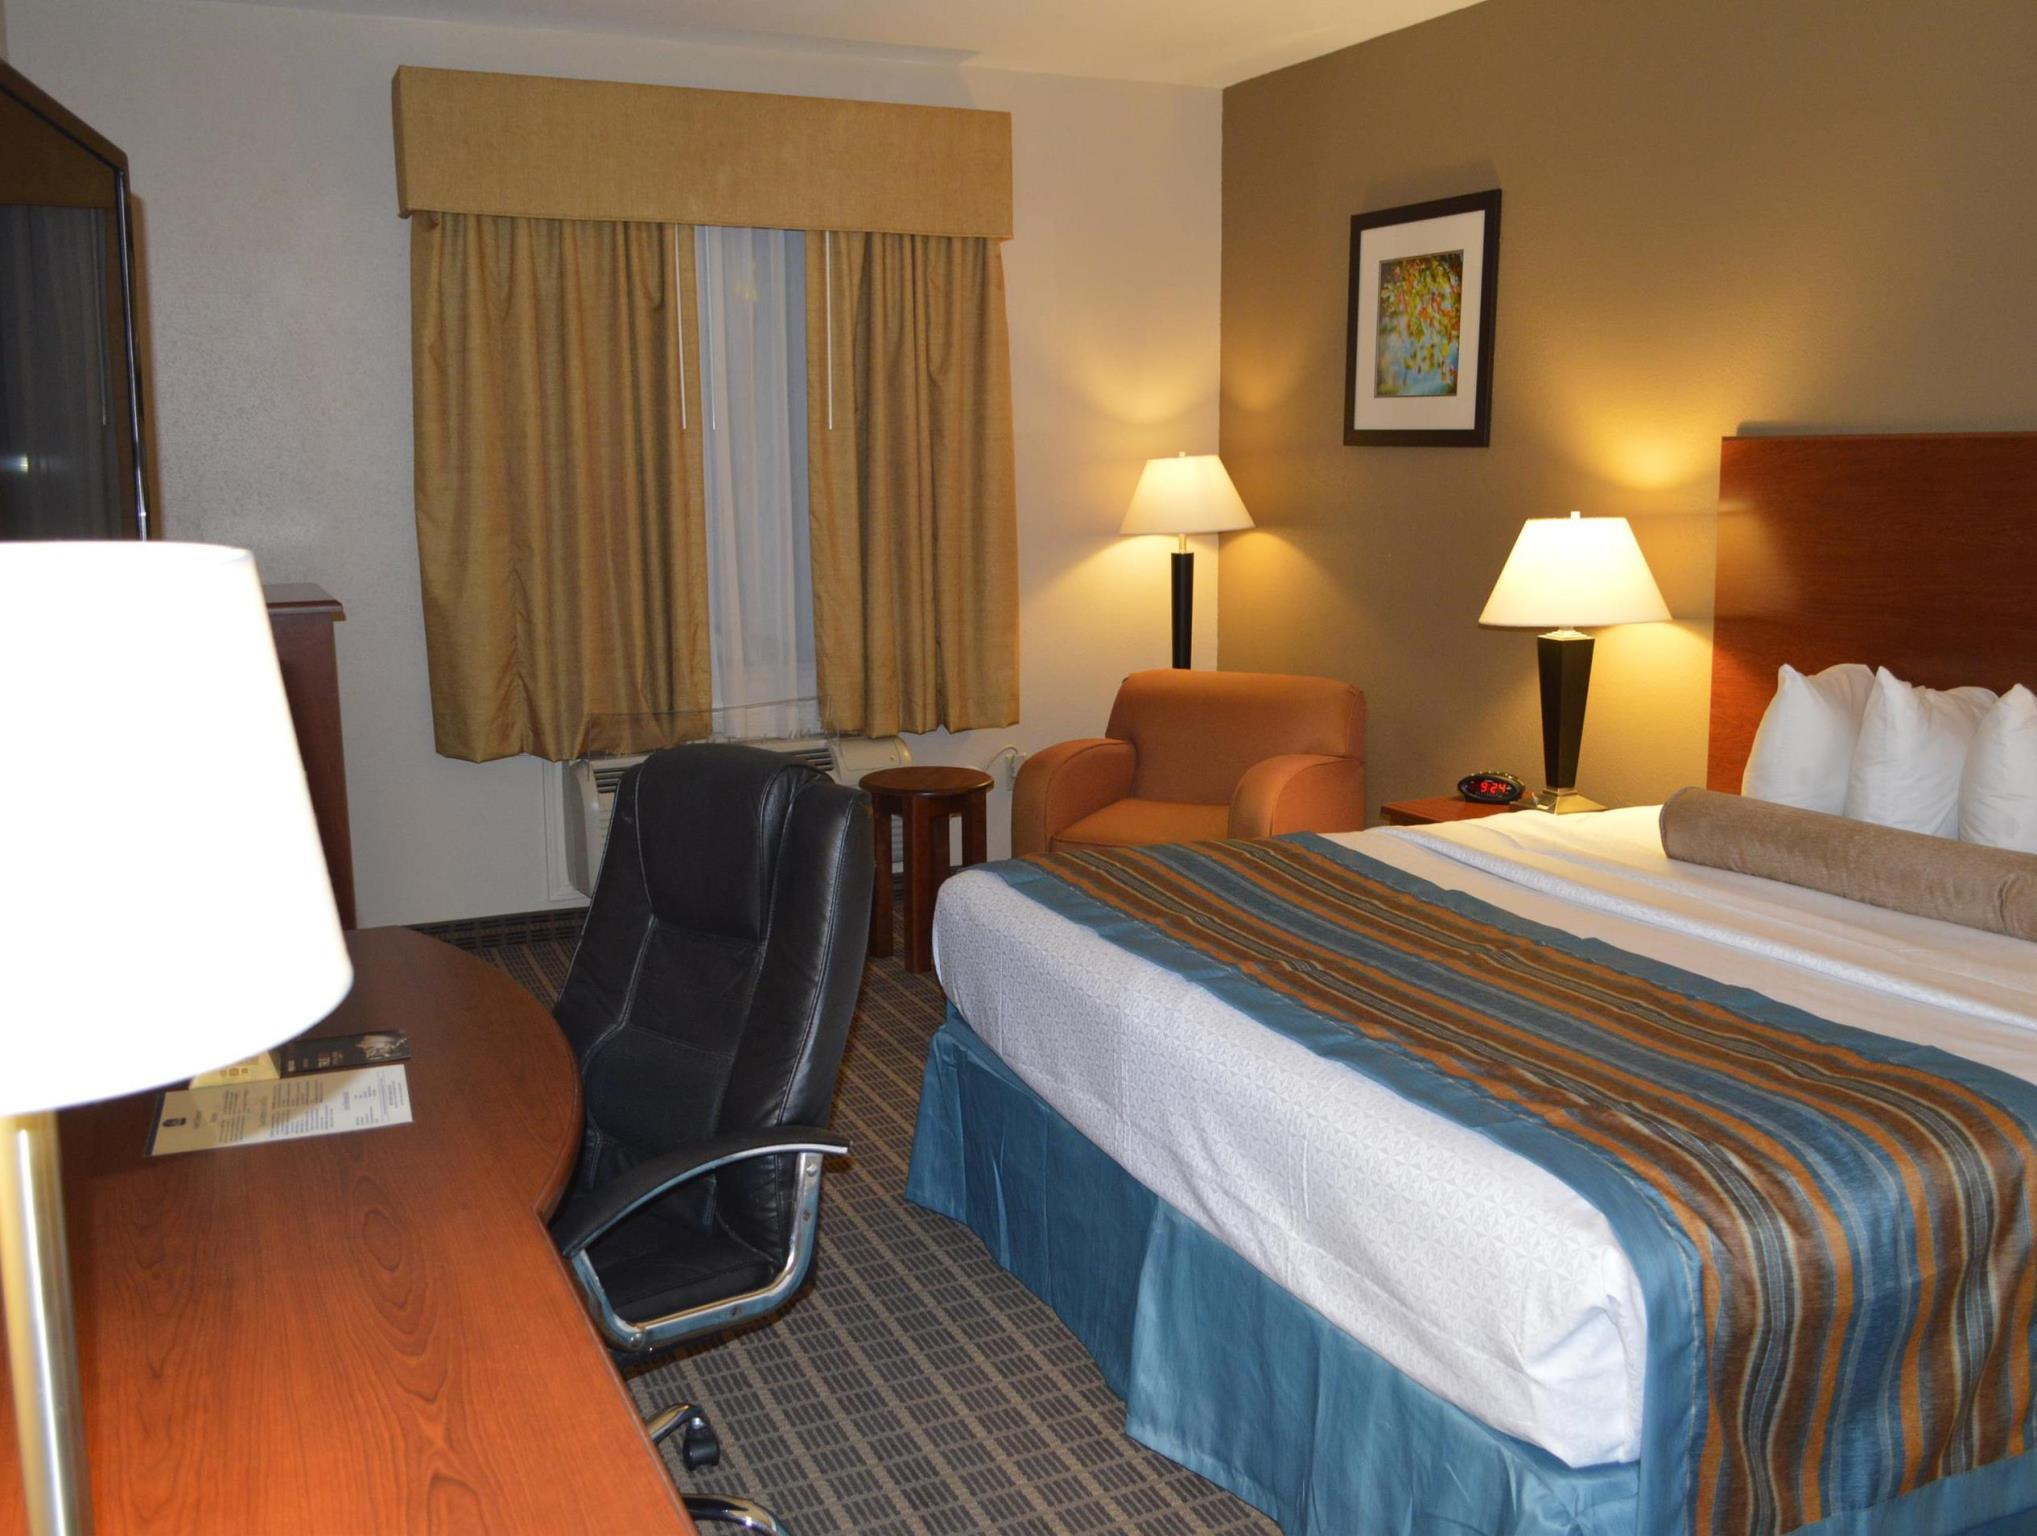 Best Western Orange Inn and Suites Discount